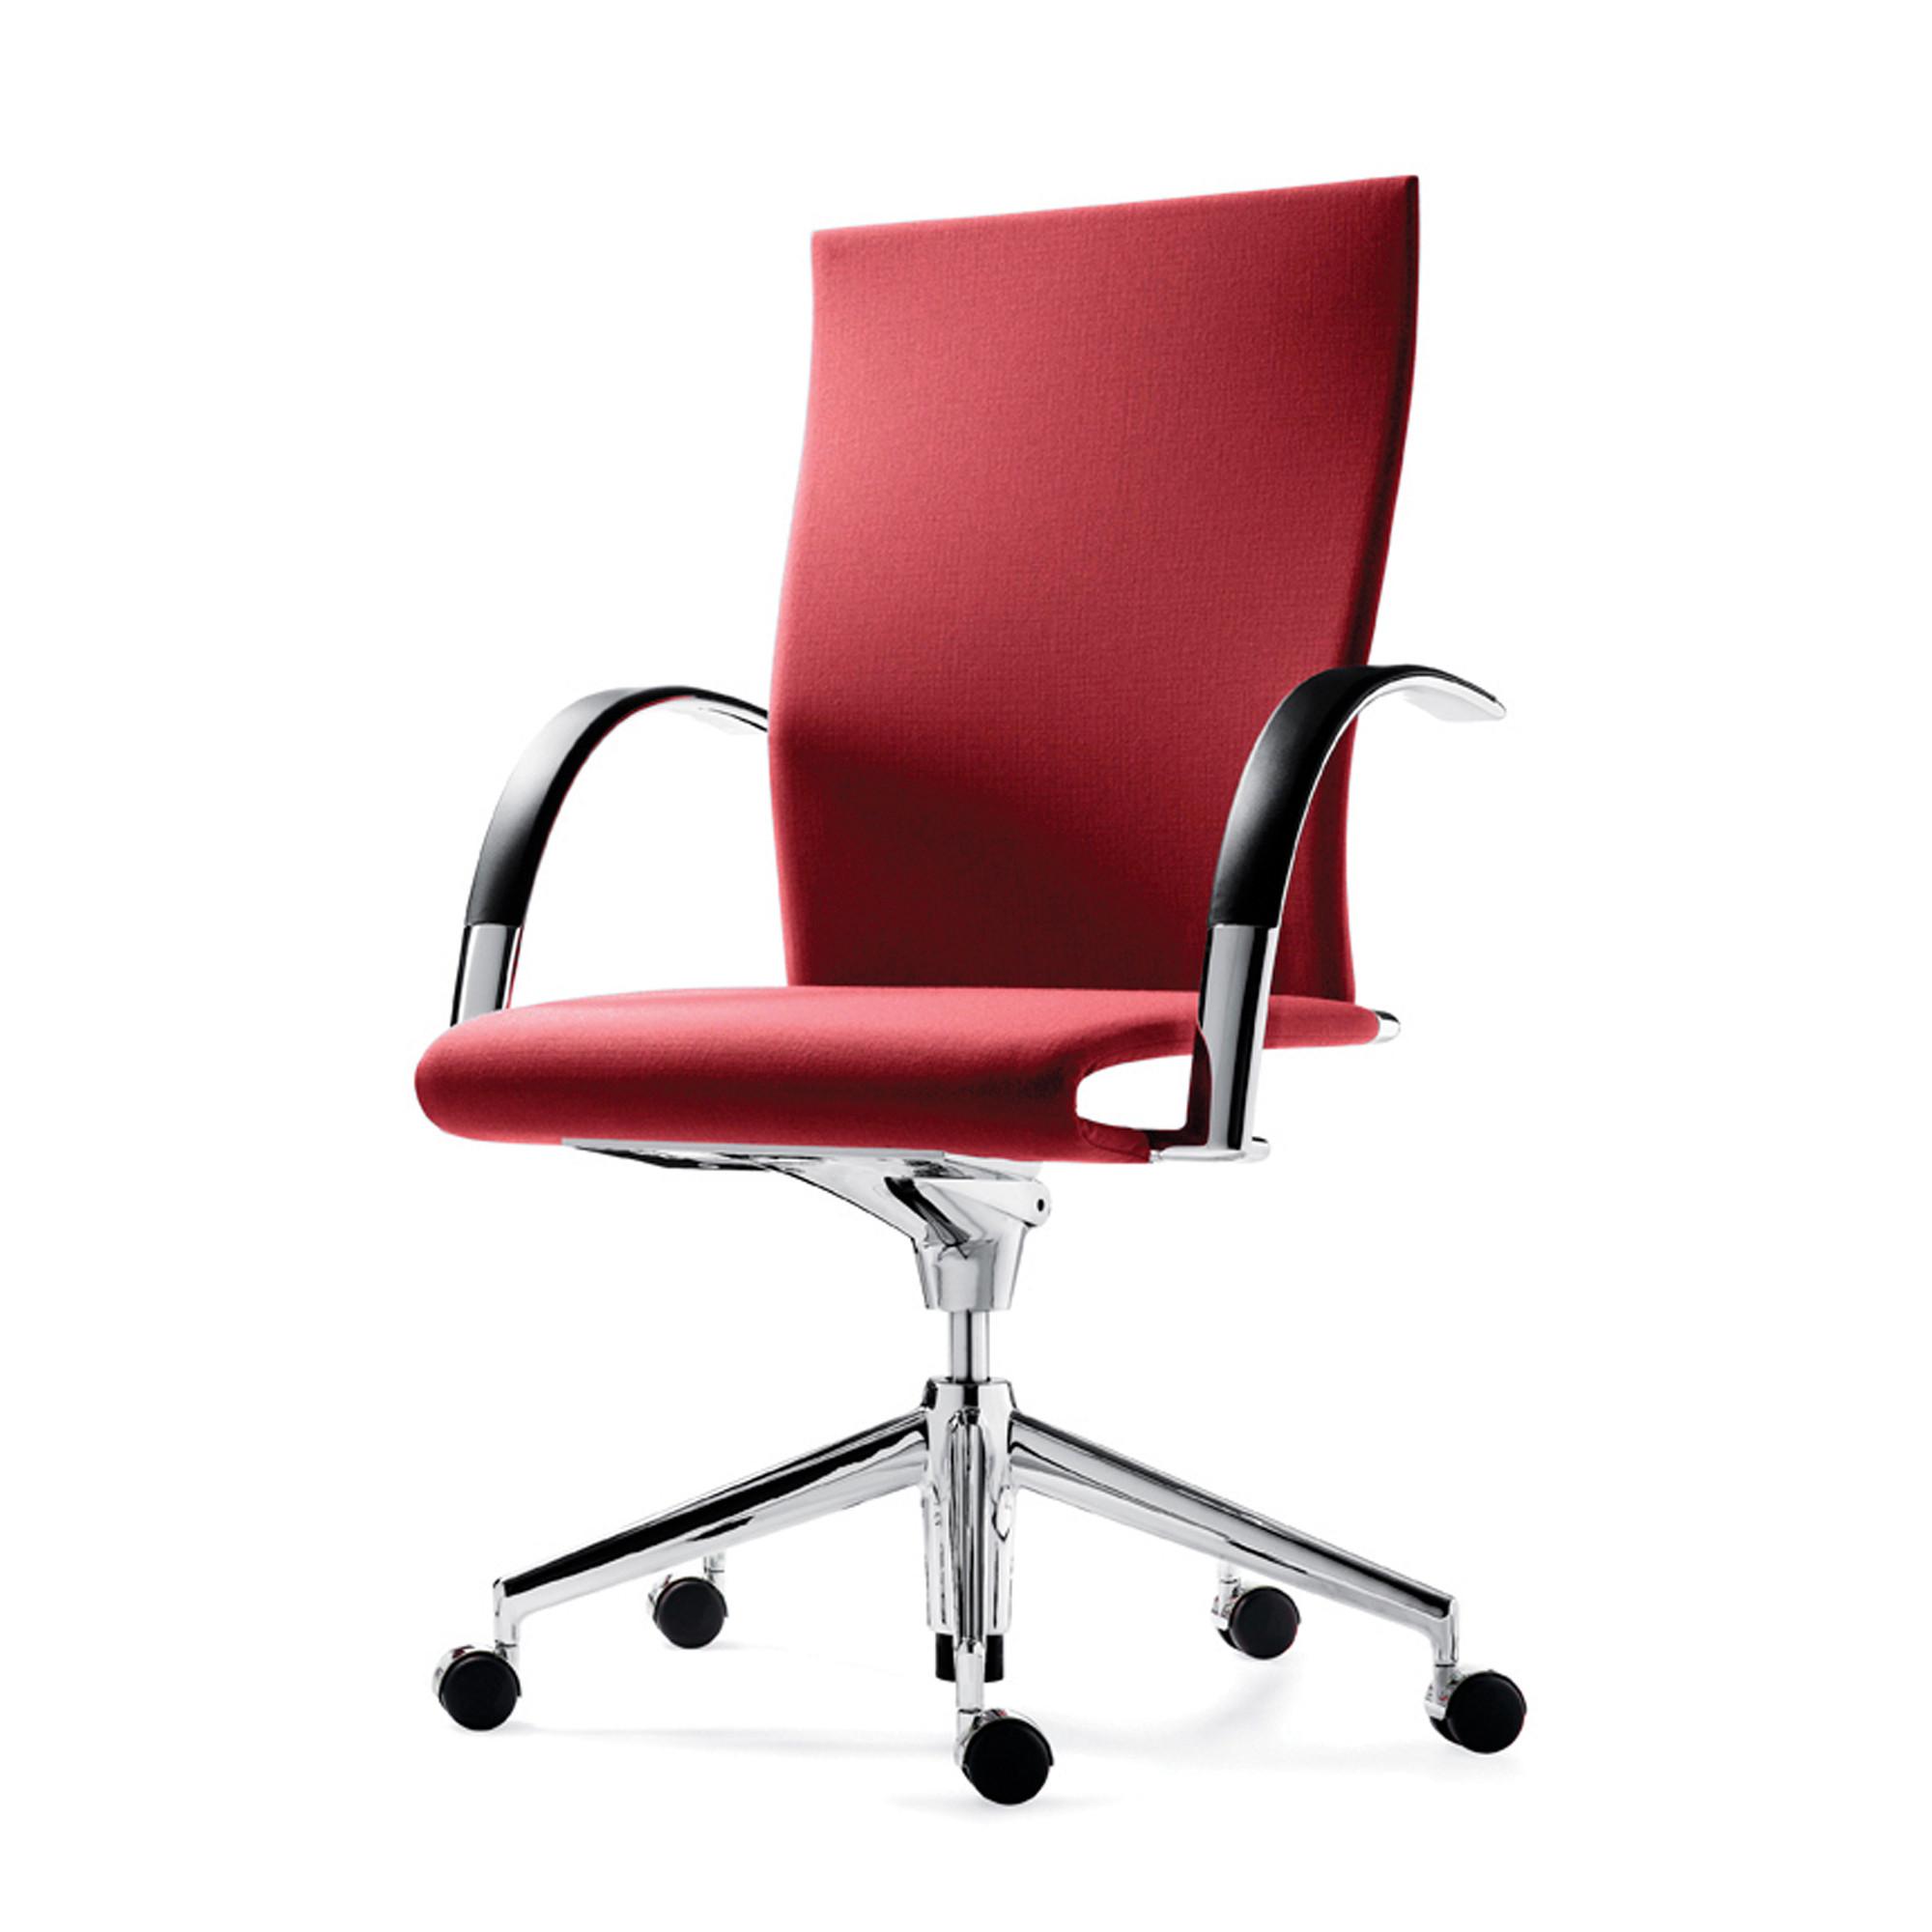 Ahrend 350 Executive Chairs